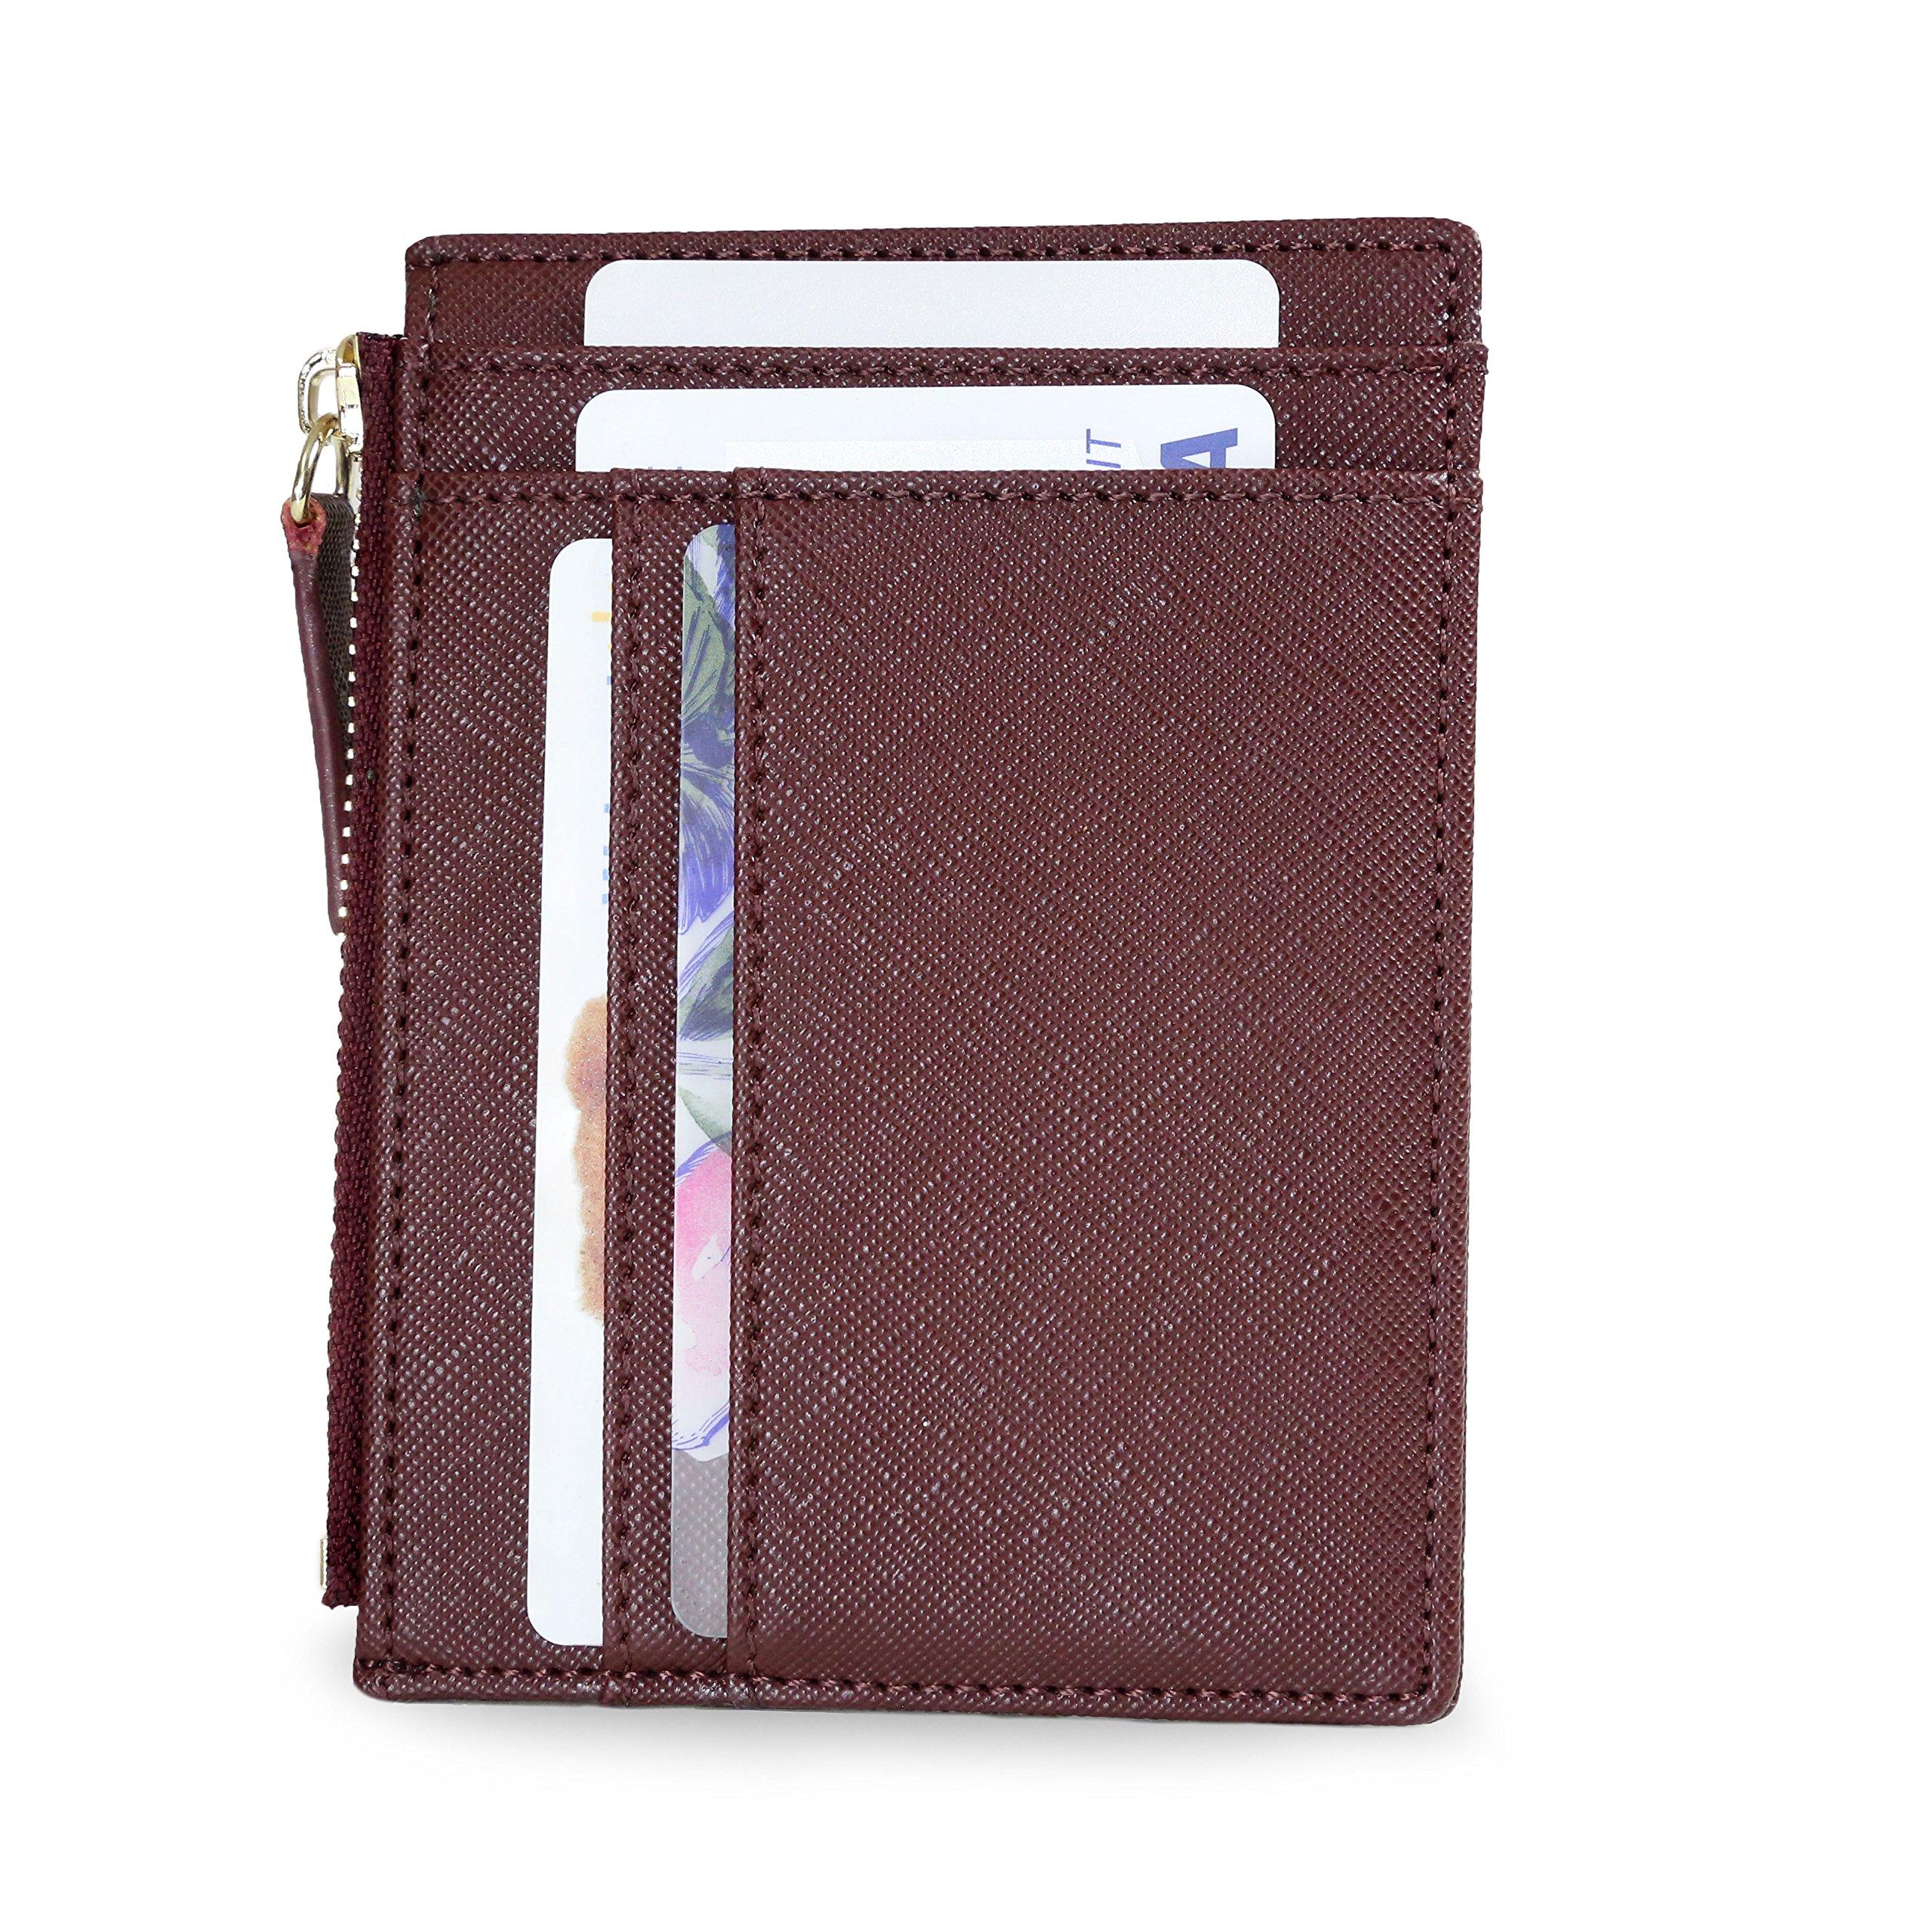 SERMAN BRANDS - Womens Wallet Rfid Blocking Credit Card Holder Slim Minimalist Wristlet Card Case Wallet with Zipper Pocket - Removable Wristlet Strap (Burgandy Ch)